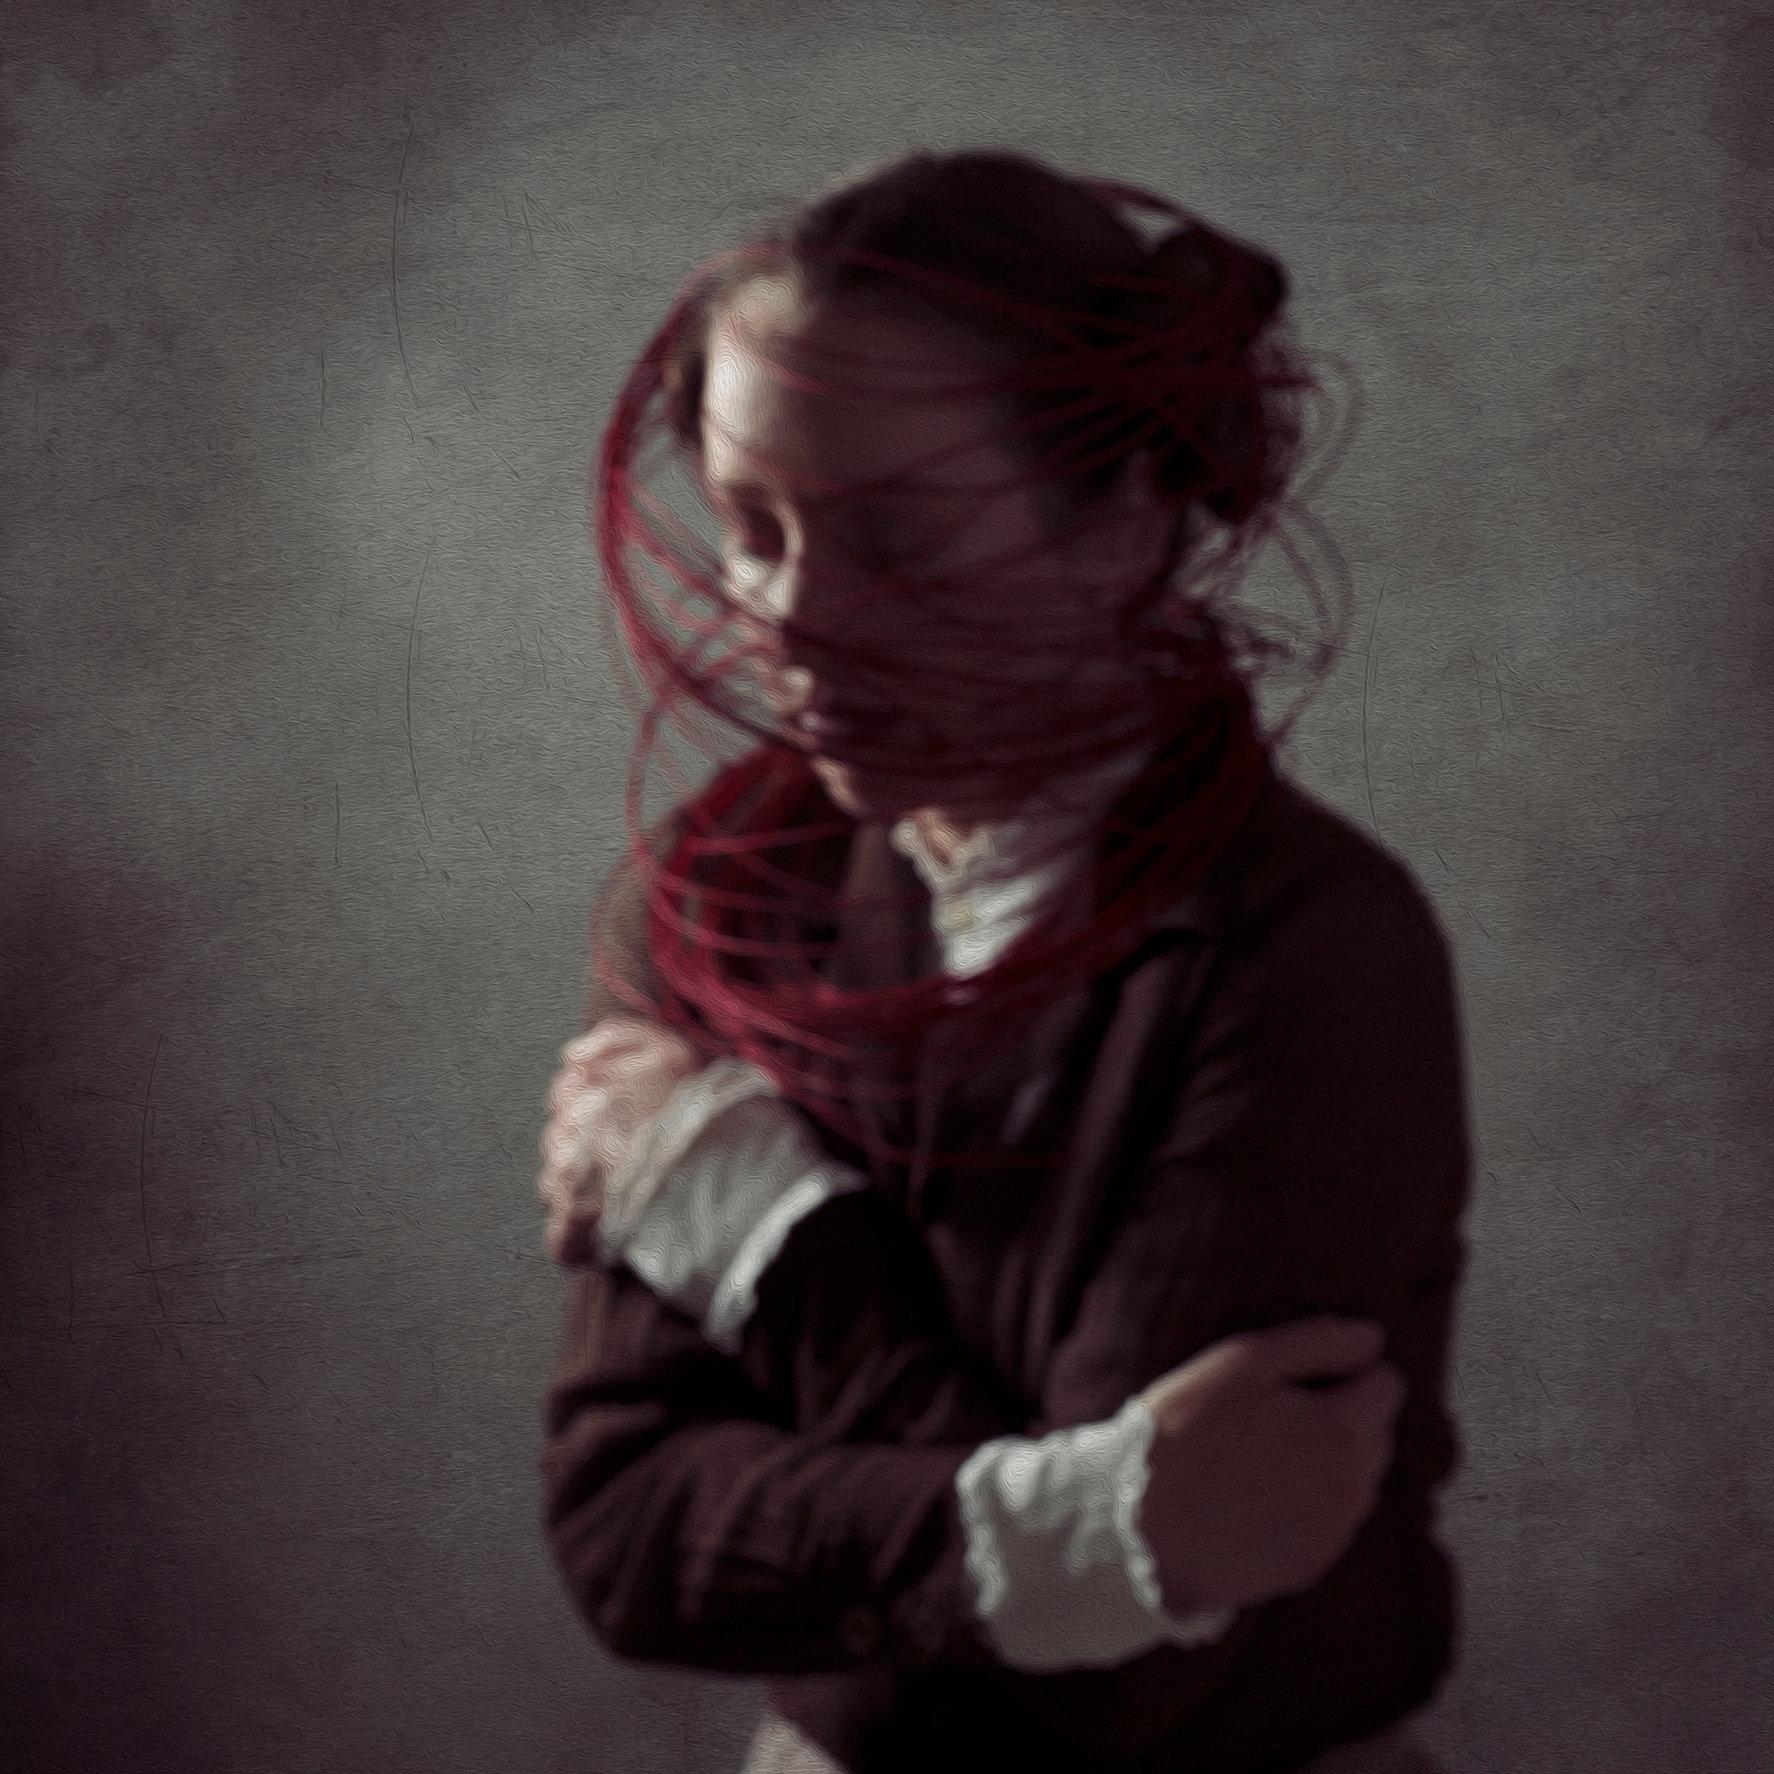 Introspection/Retrospection (c)2014 - Kurt Liefsoons